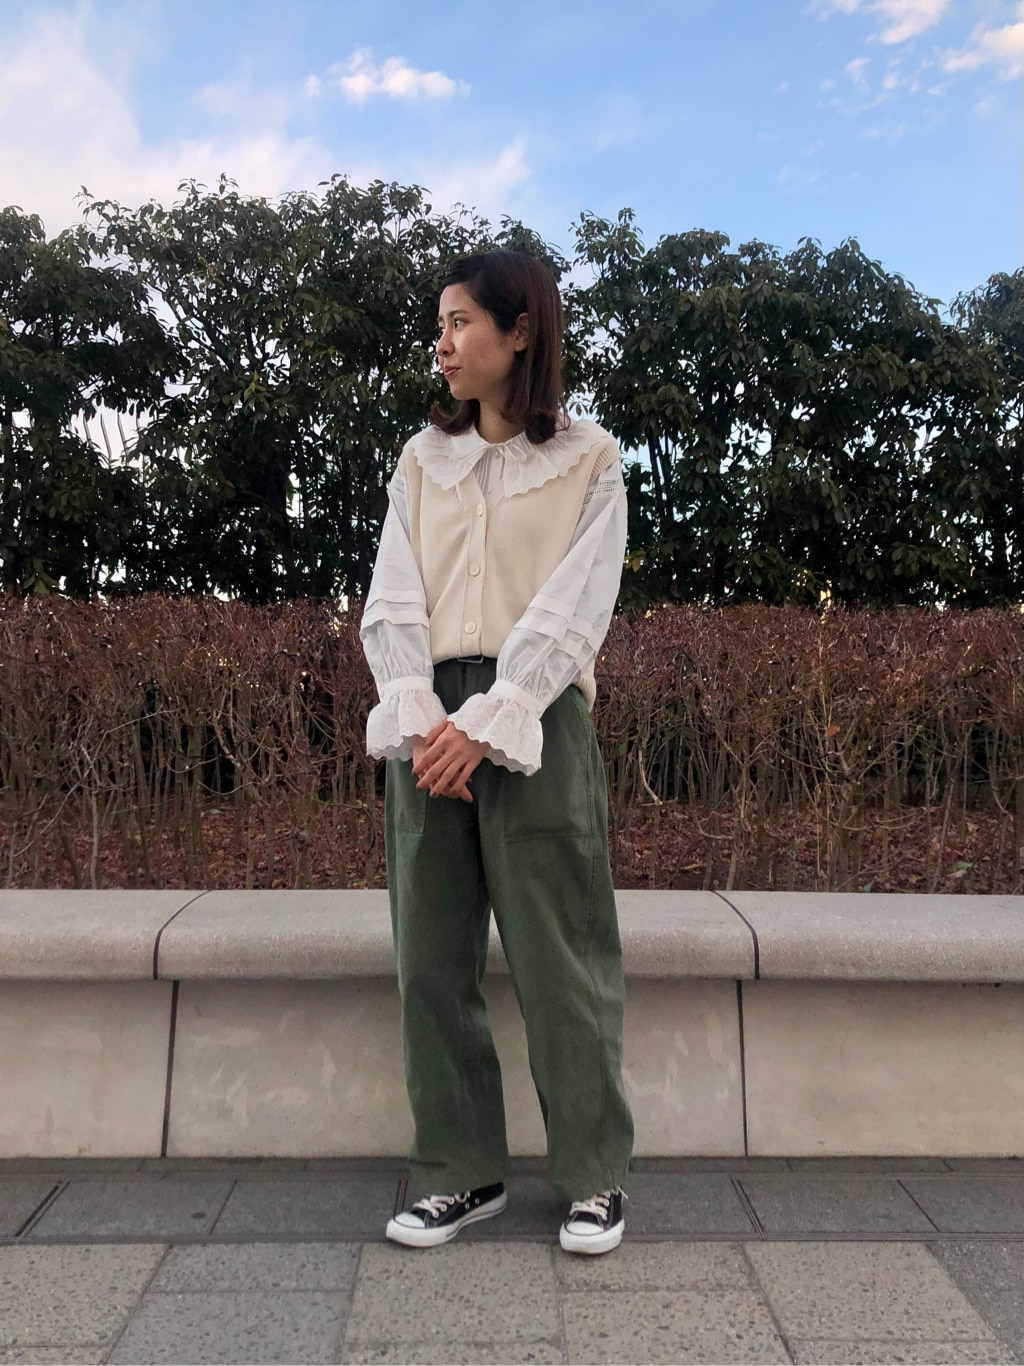 CHILD WOMAN , PAR ICI 東京スカイツリータウン・ソラマチ